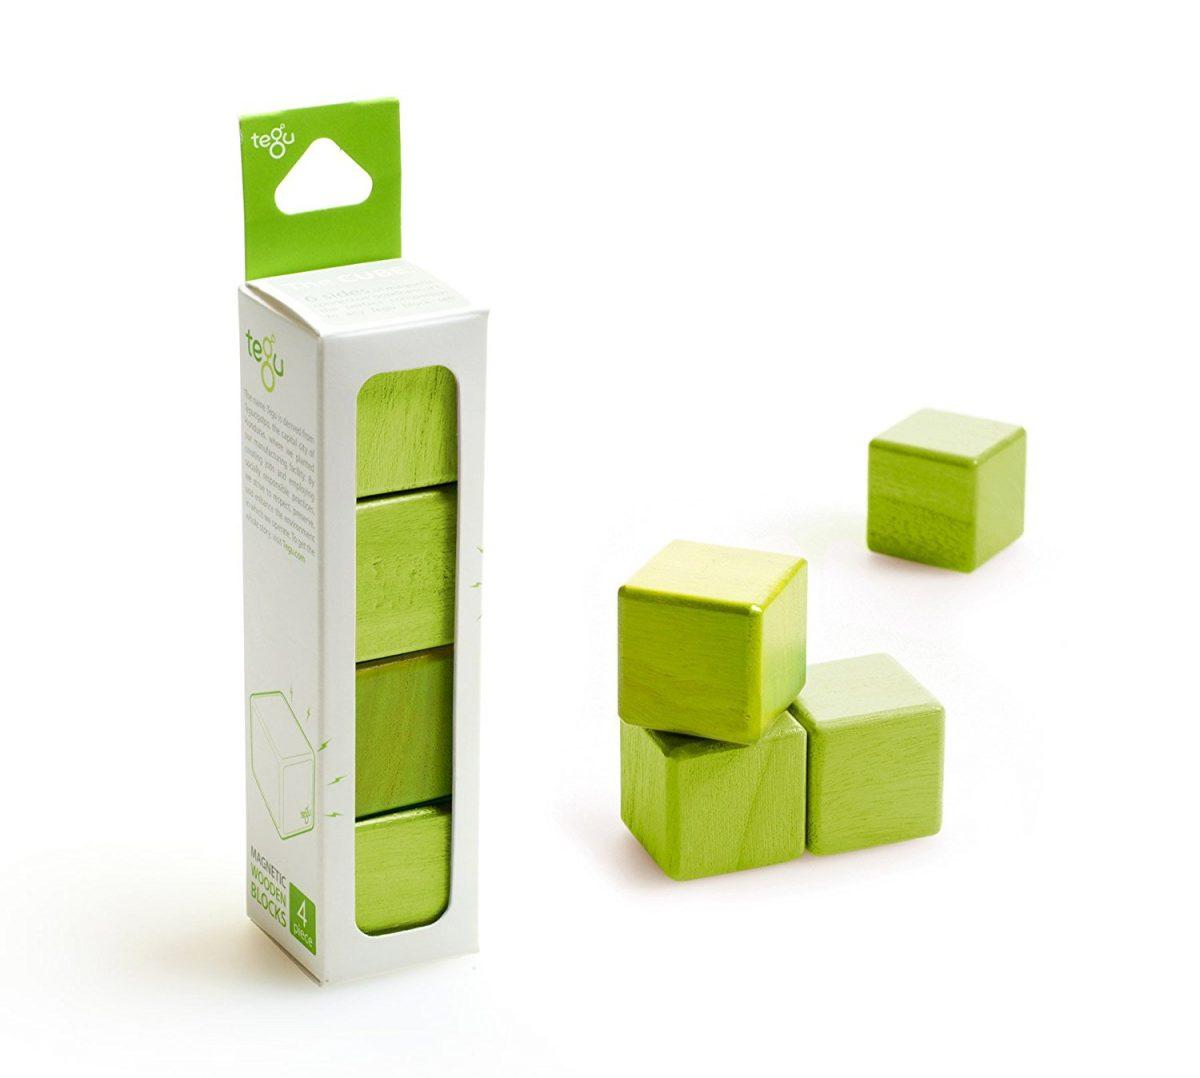 4 Piece Tegu Magnetic Wooden Block Cube Set